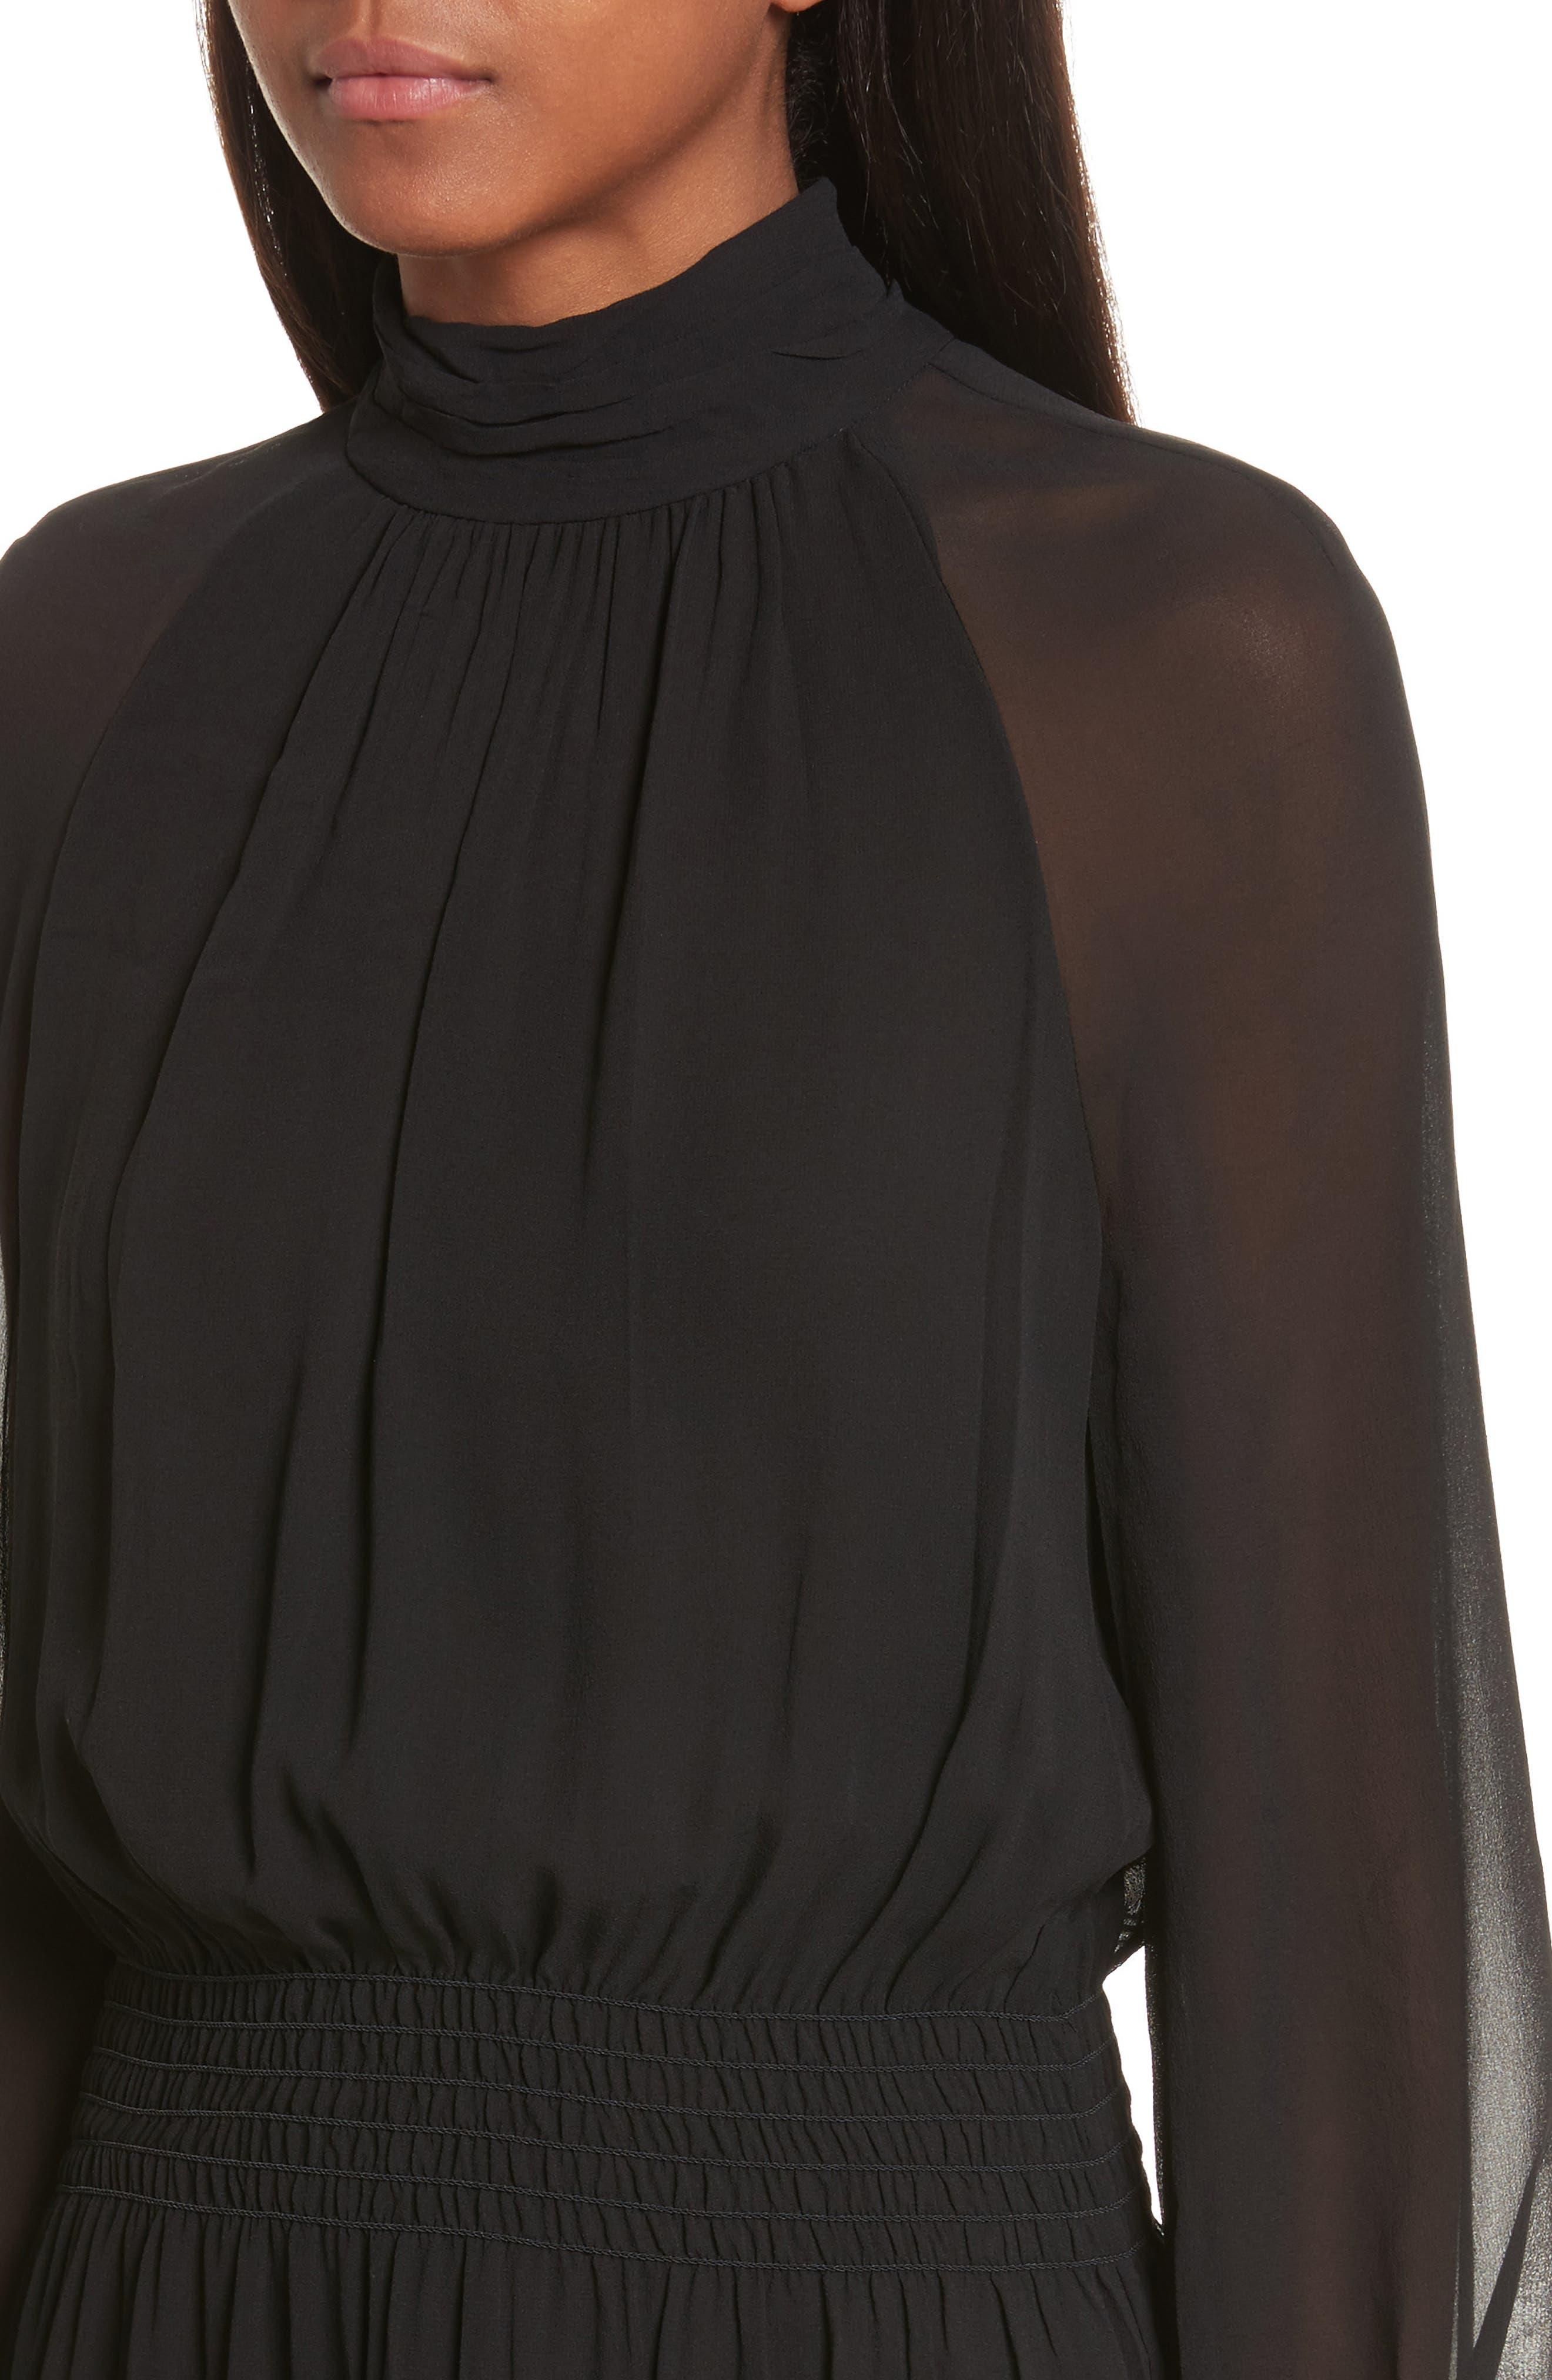 Collette Silk Midi Dress,                             Alternate thumbnail 4, color,                             001